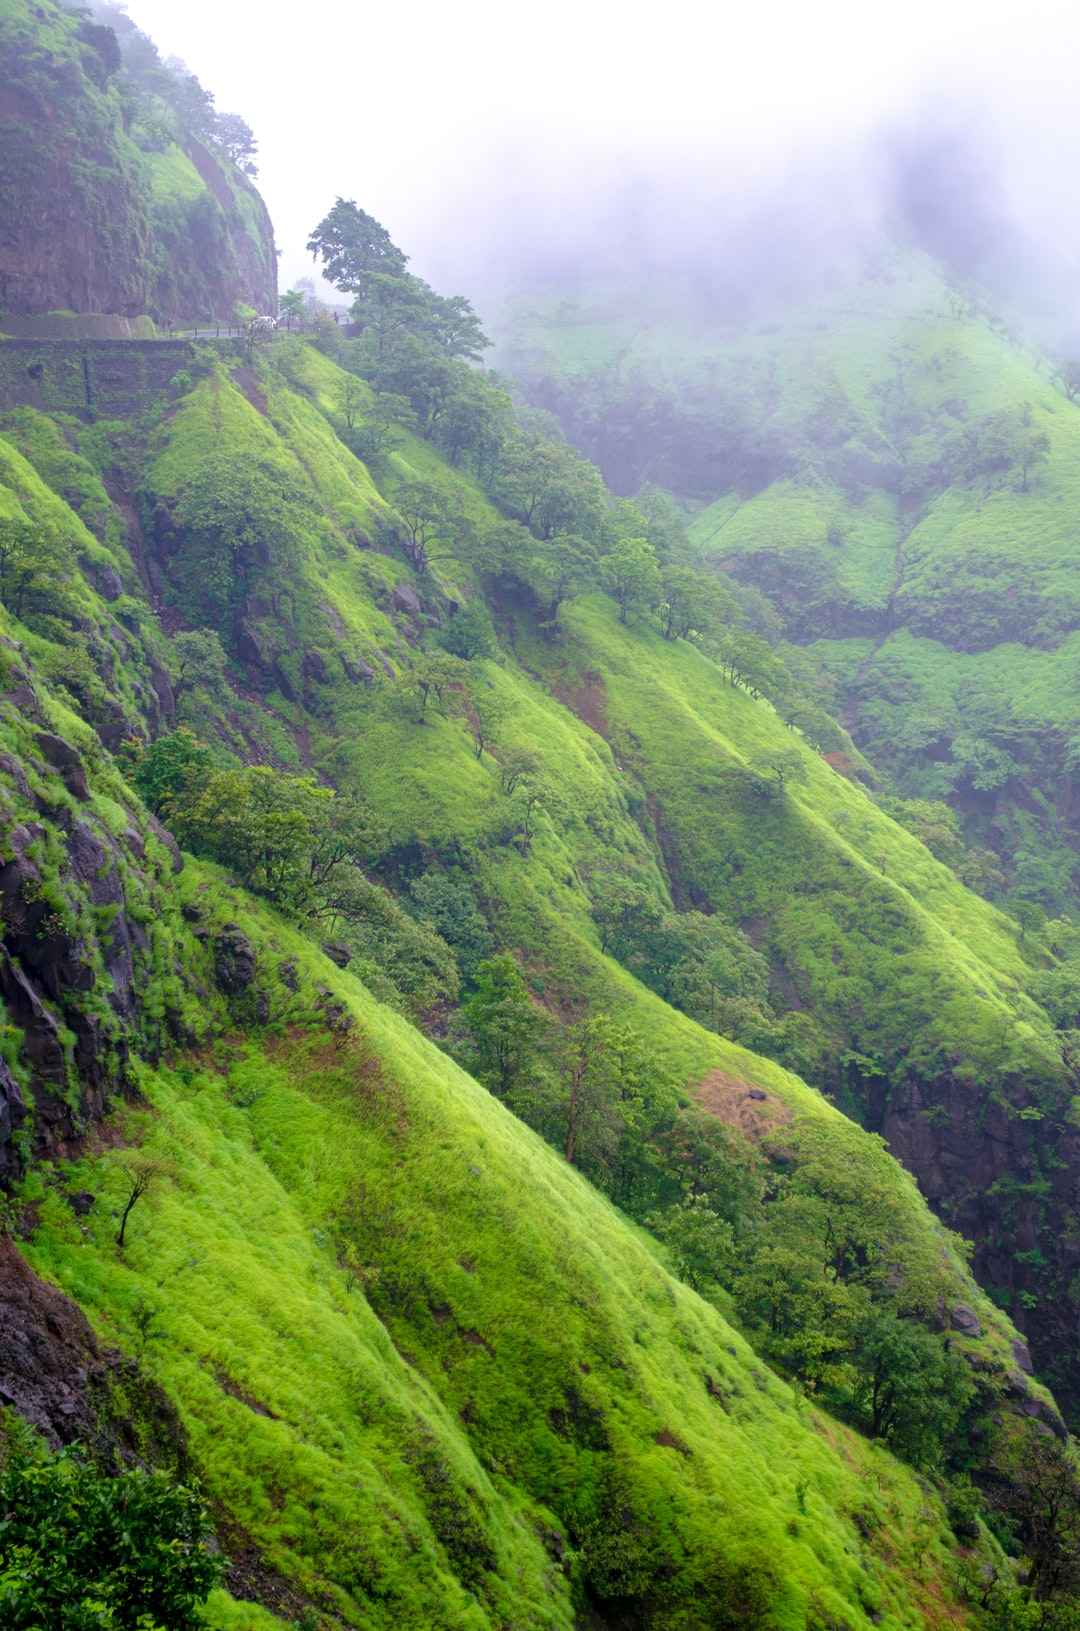 Hills in the Varandha Ghats of Maharashtra during monsoon season. Ideal for trekking and camping.